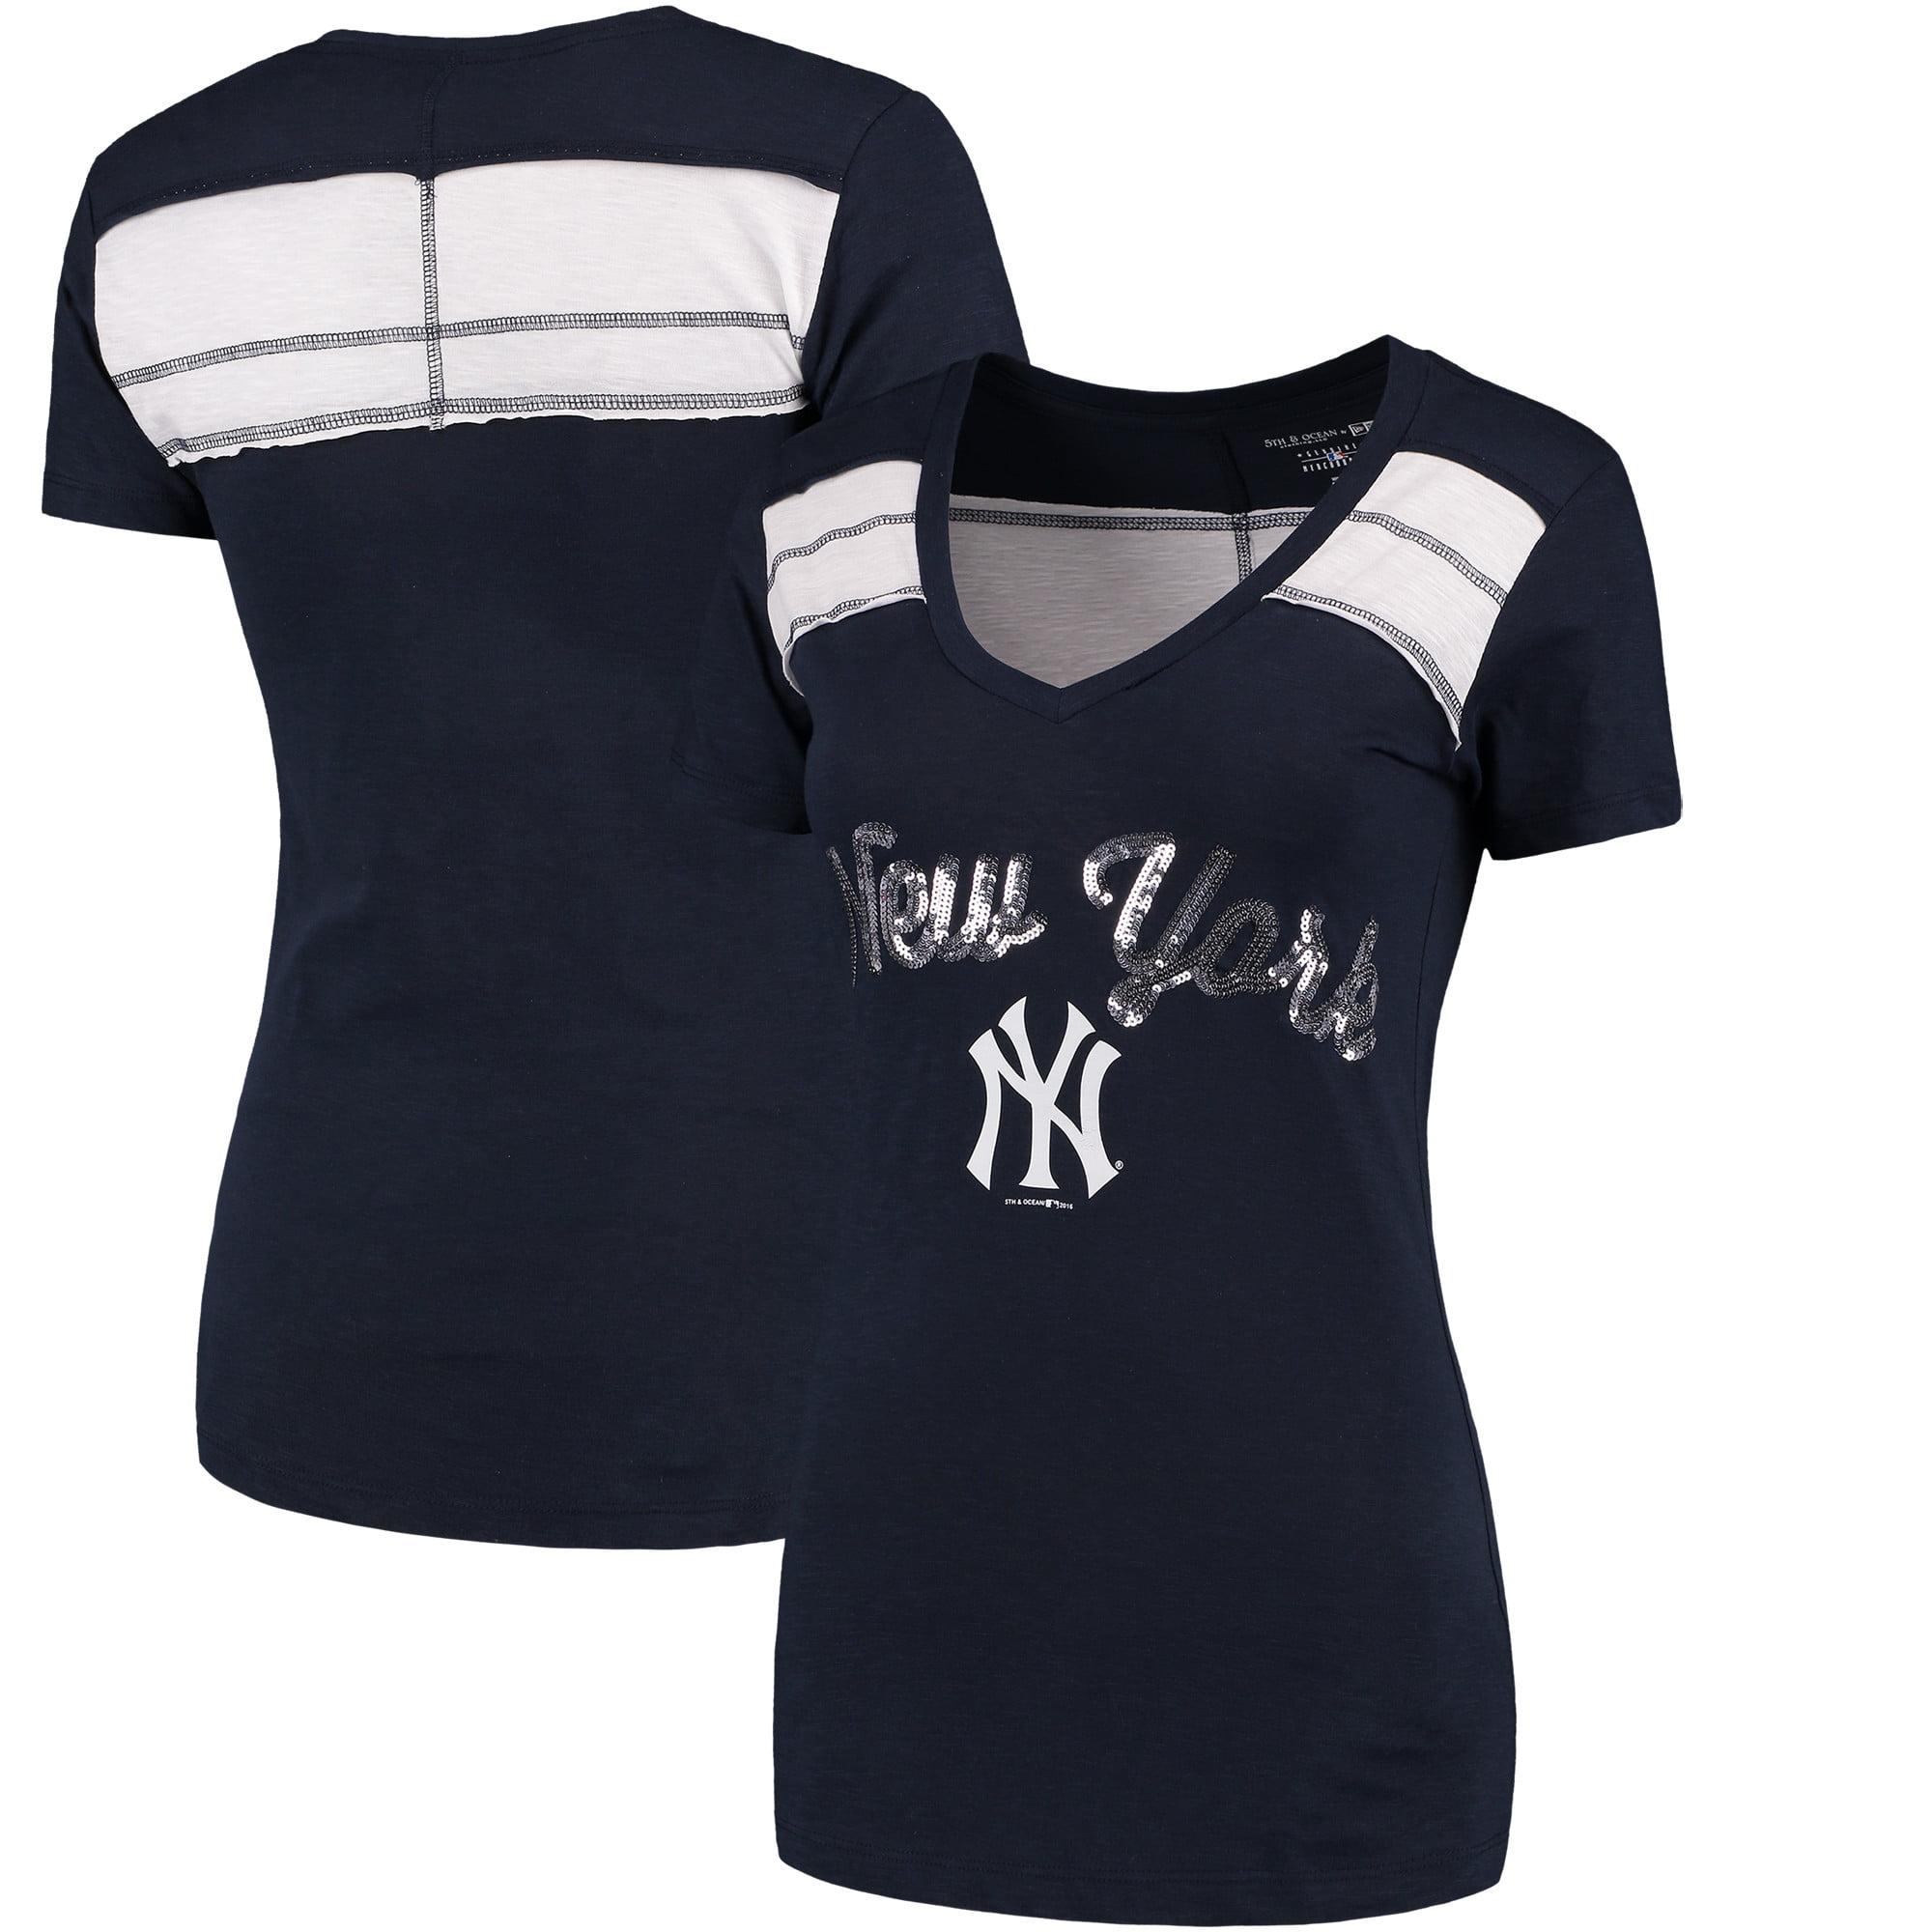 New York Yankees 5th & Ocean by New Era Women's MLB Slub V-Neck With Contrast Inserts T-Shirt - Heathered Navy